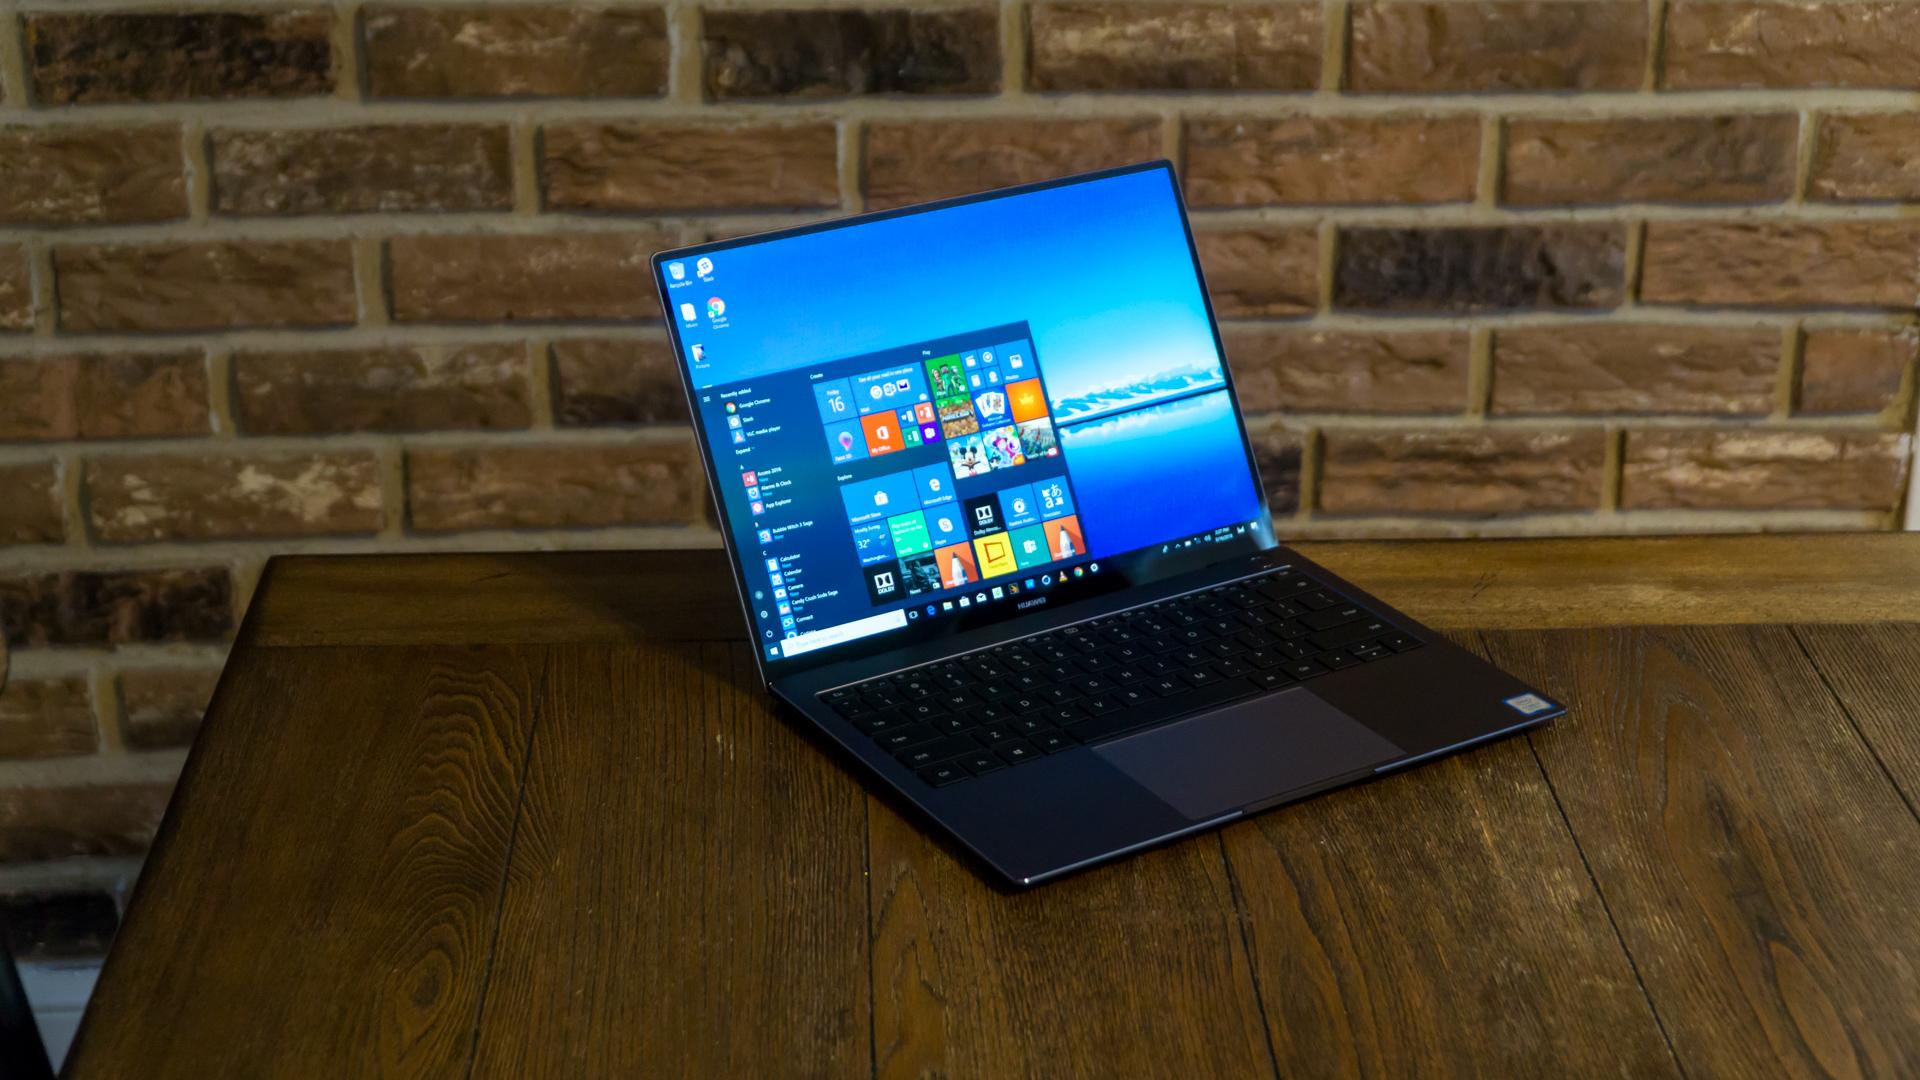 Best business laptops 2018: top laptops for work - Tech ...